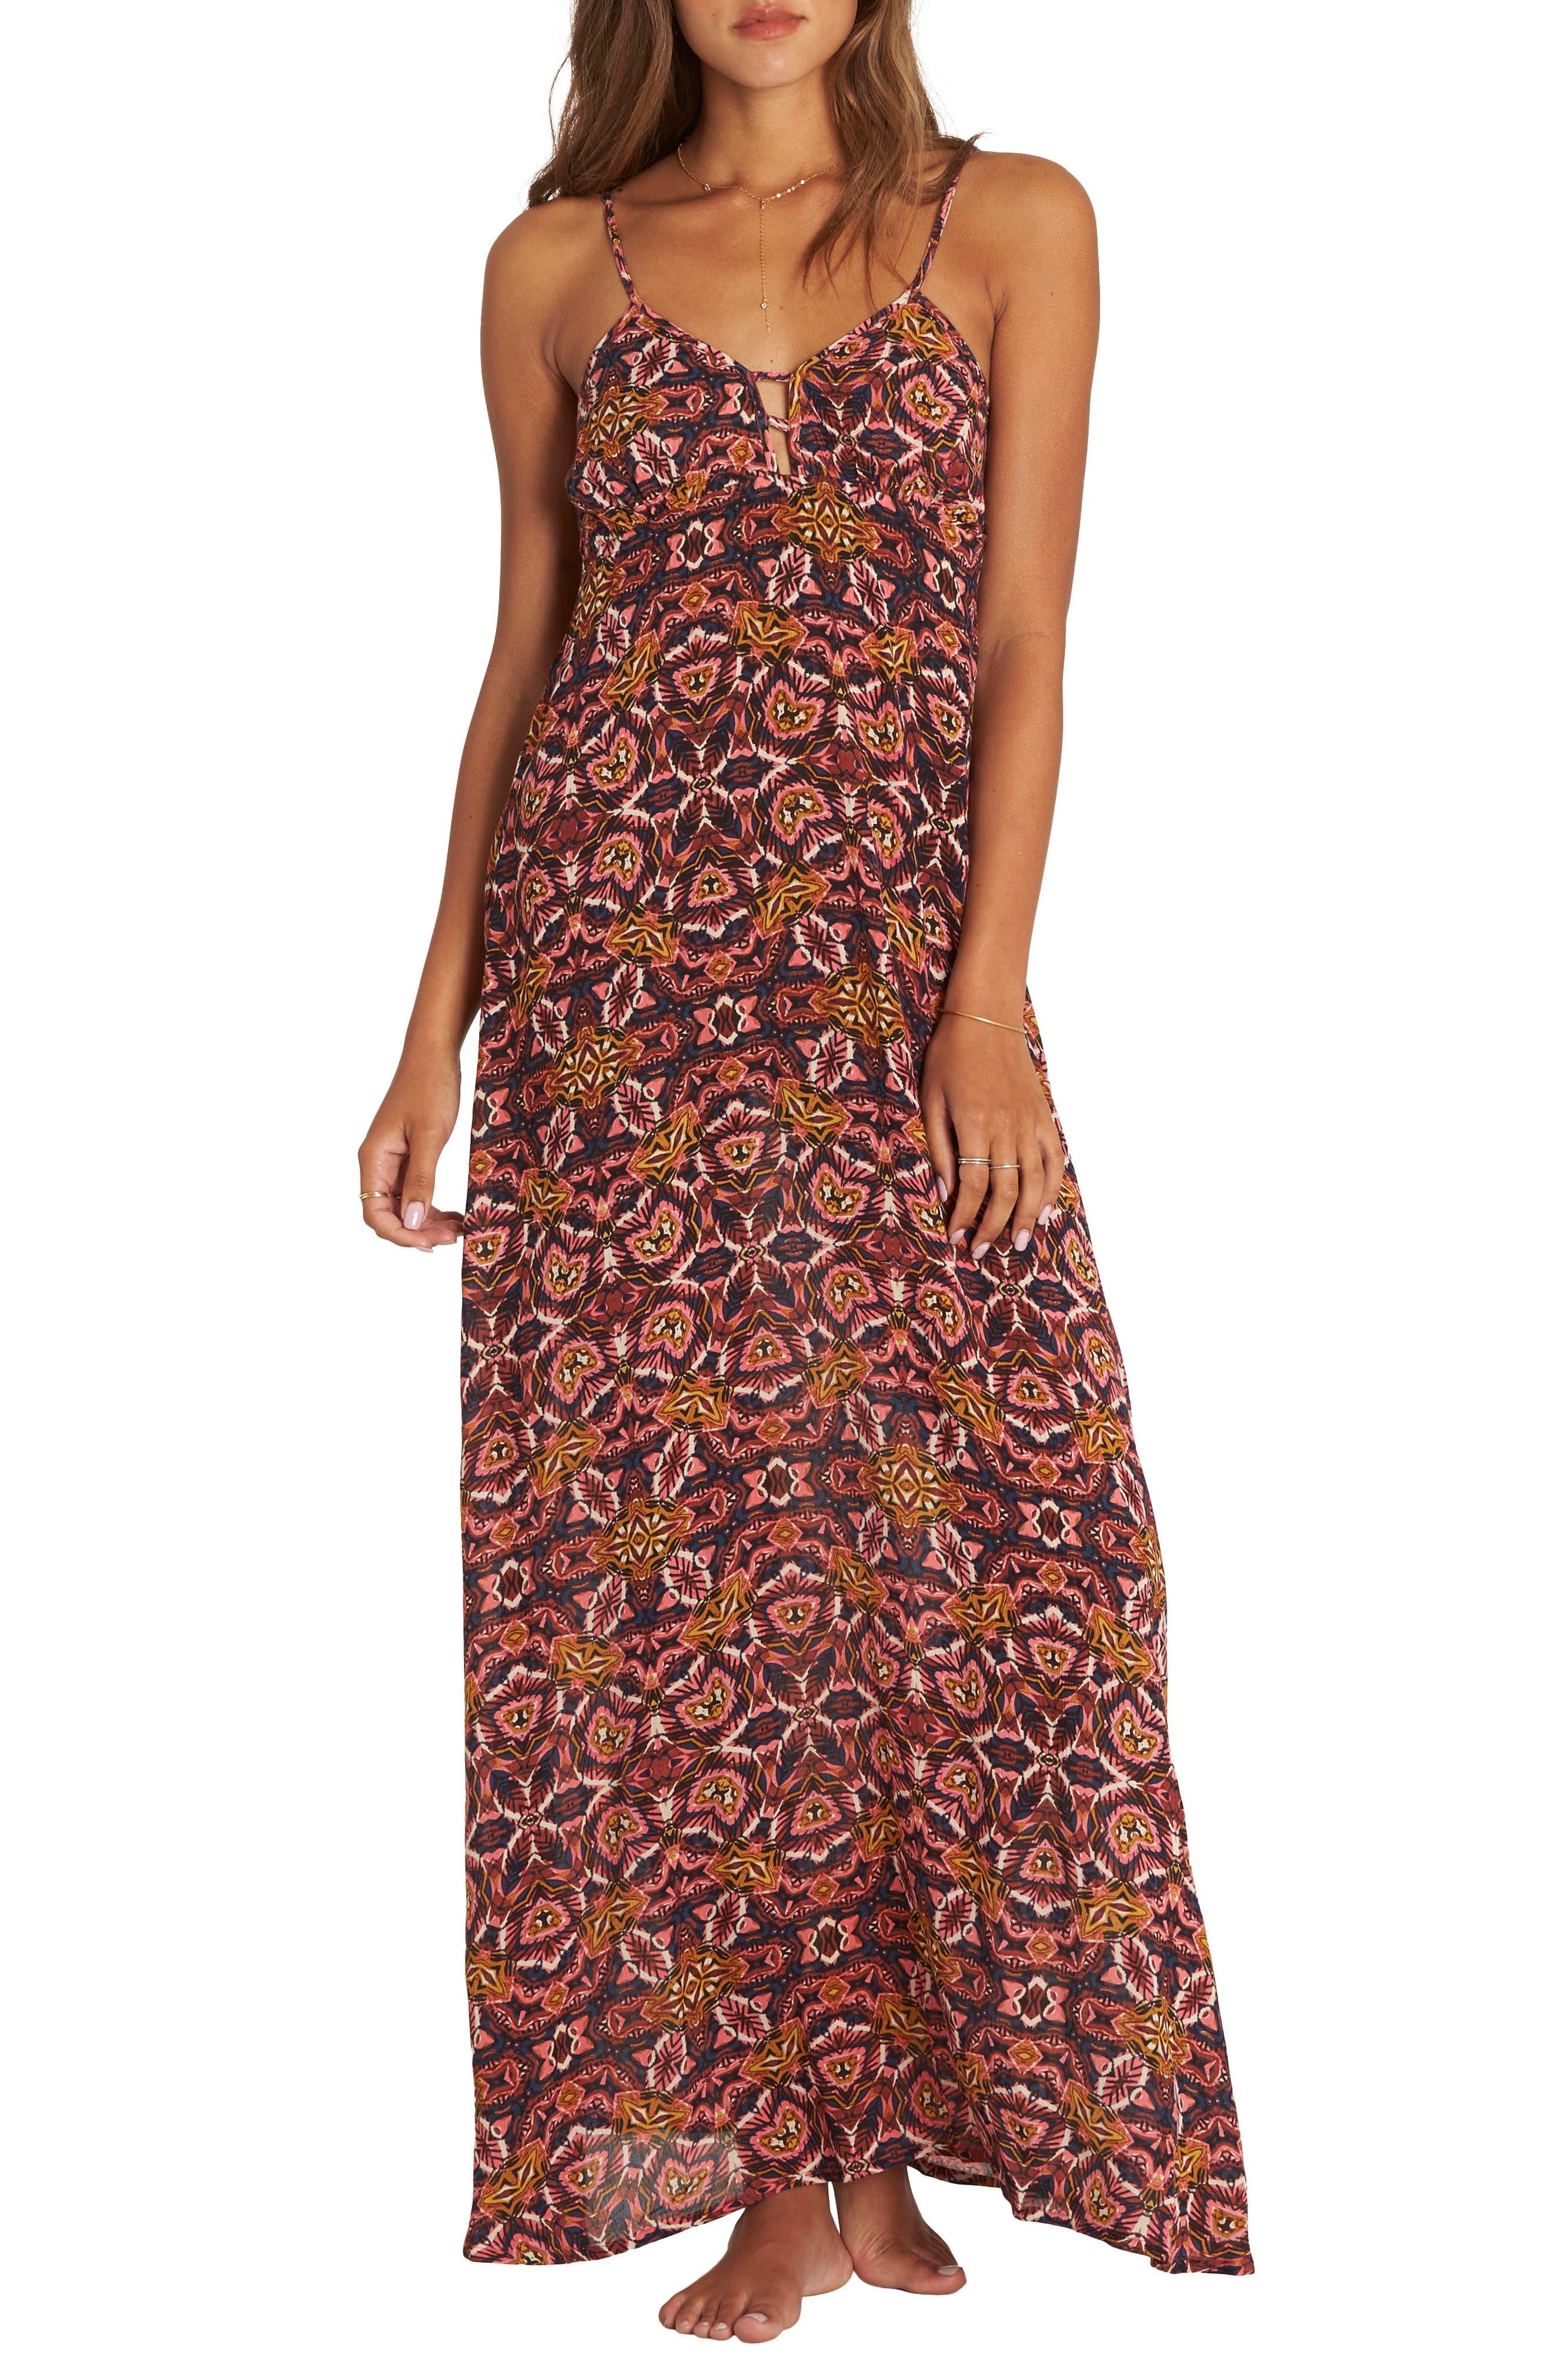 Sky On Fire Maxi Dress,                         Main,                         color, 403